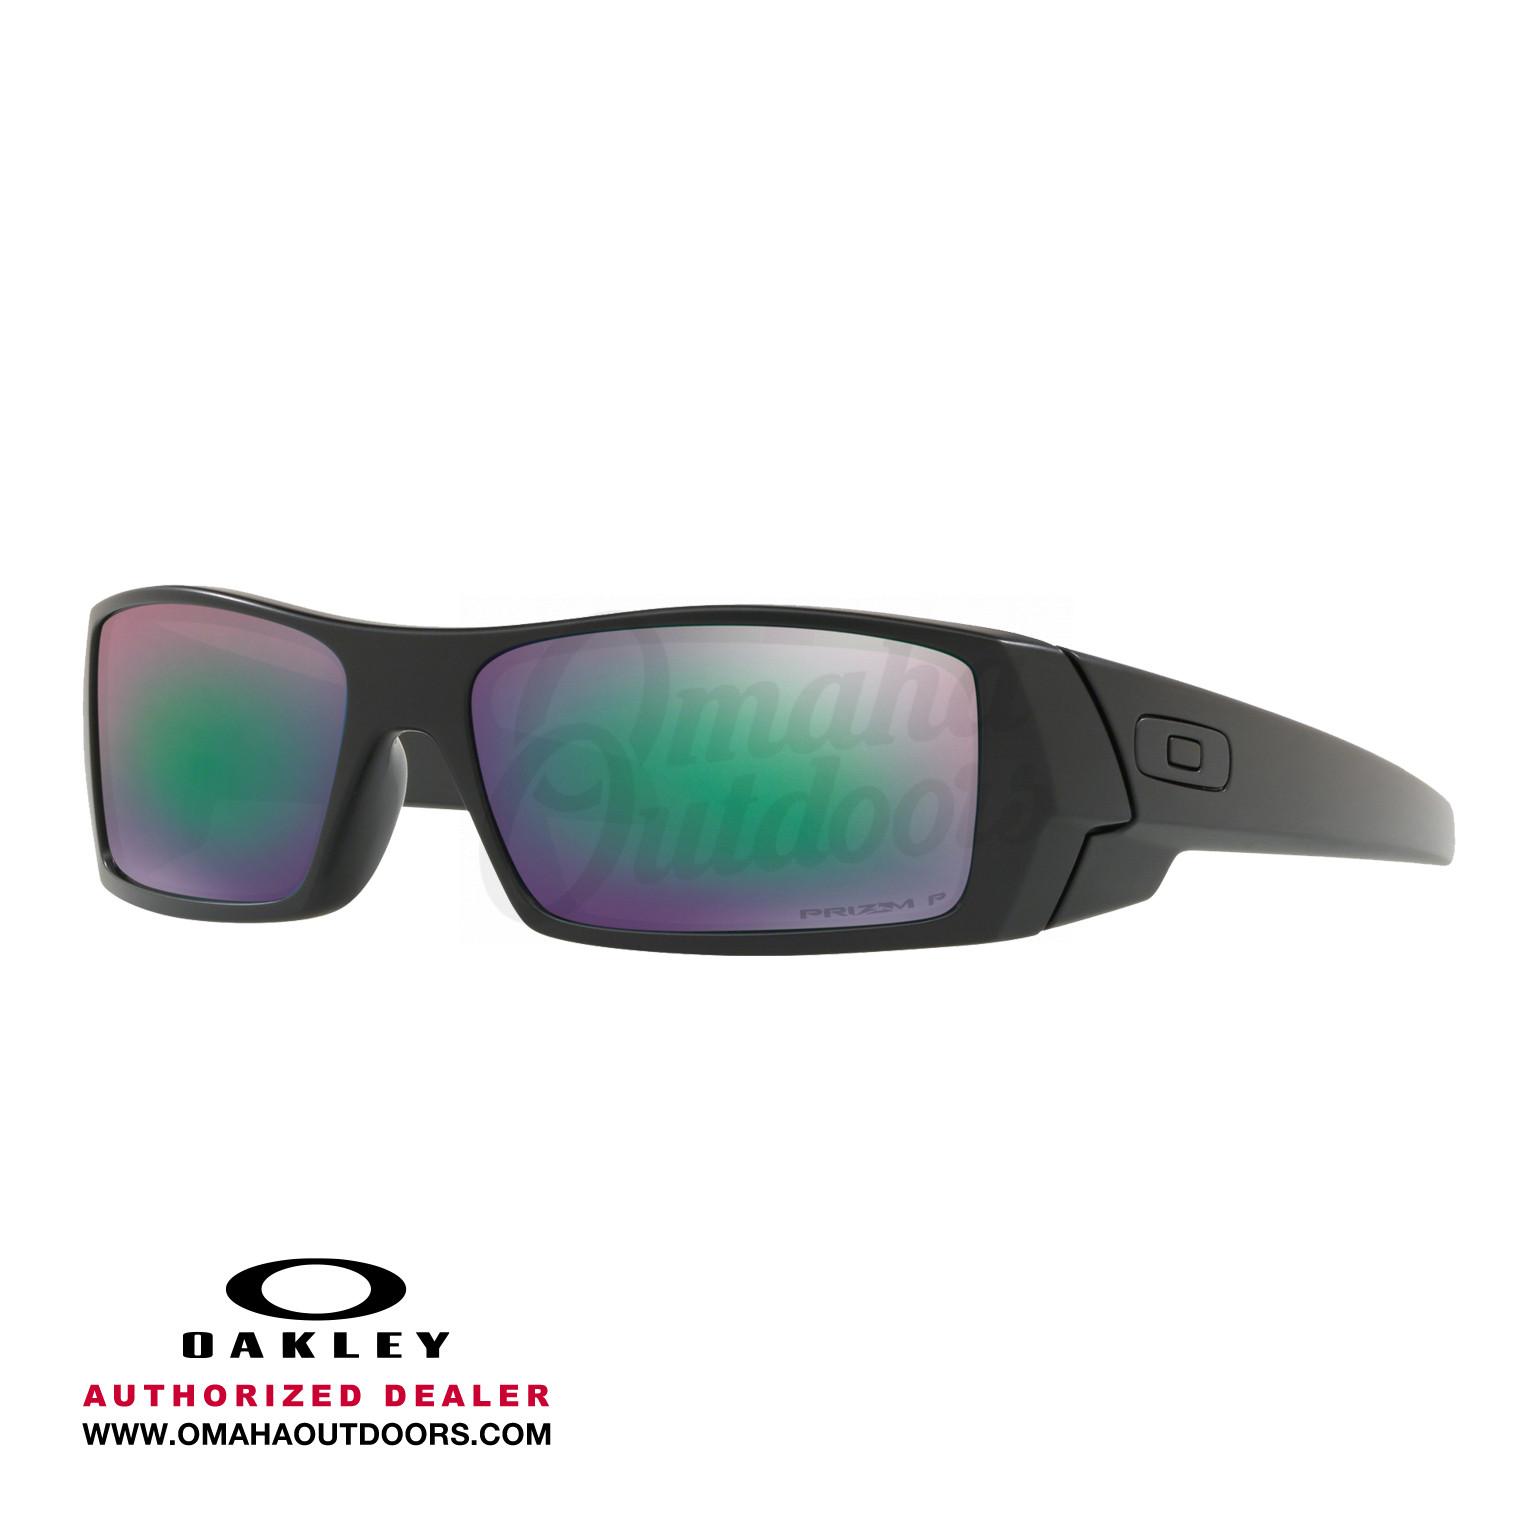 0393da9bfd Oakley SI Gascan Maritime Sunglasses Prizm Maritime Polarized Lens